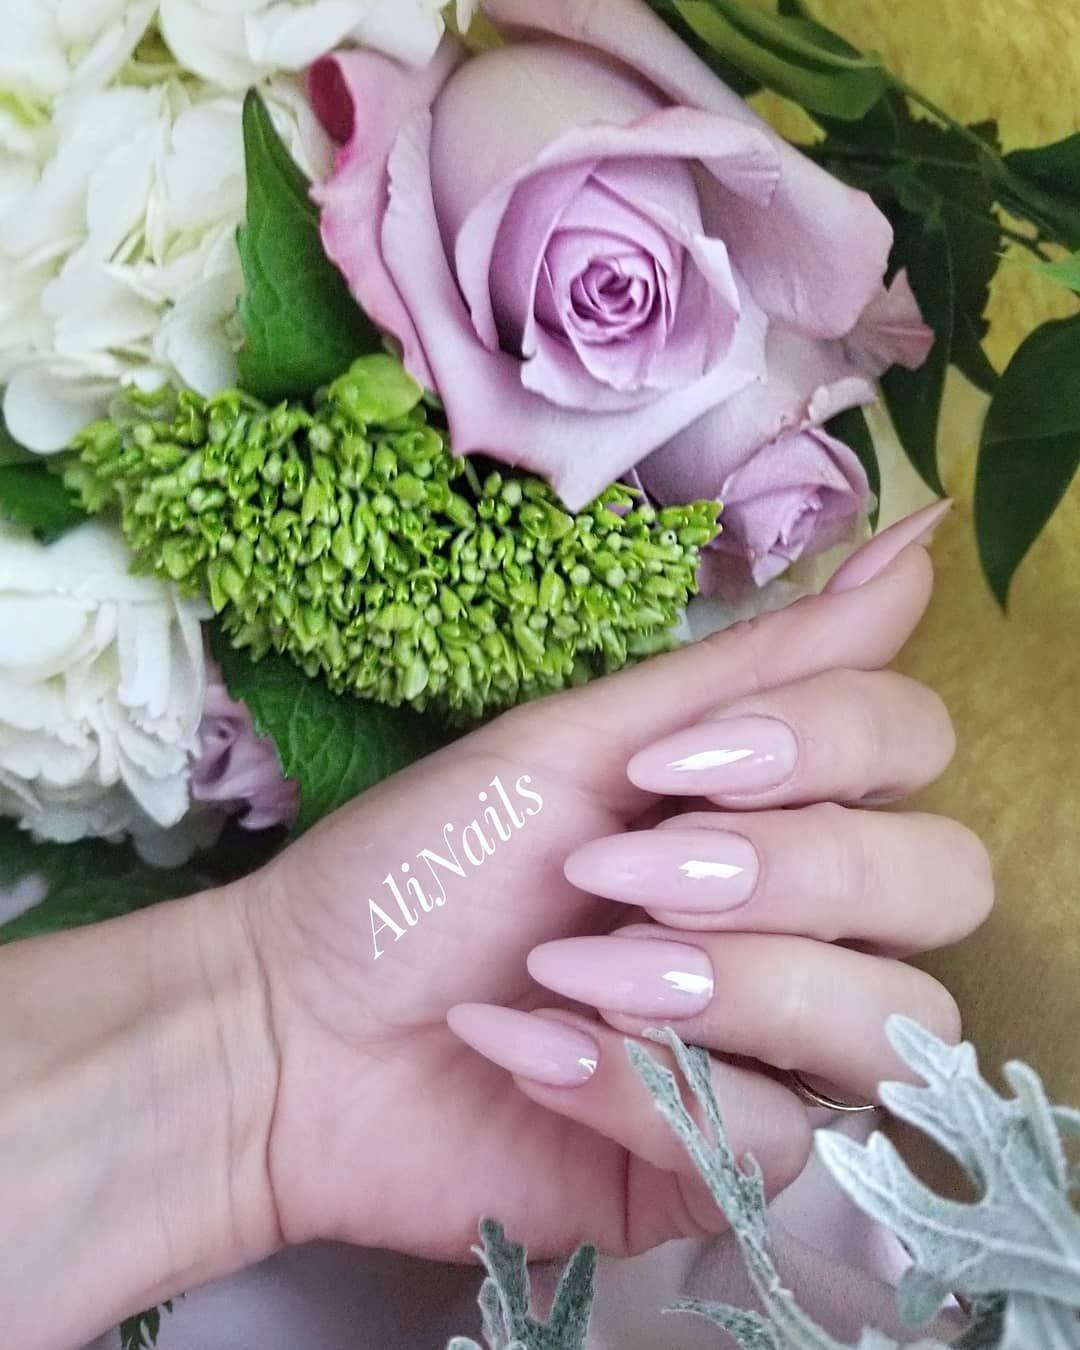 My favourite Almond shape ...Gel Nails Extension #hardwarecombinedmanicure #hardwaremanicure #nails #ногти #nailsforyou #nailslover #pinknails #камуфляж #pinkbuildergel #macksprofessional #nailsinchicago #nailsdesign #lovenails #nailsofinstagram #nailsart #nailsloca #lovedoingnails #lovemyjob #nail #nailstime #instagramnails #nailsofinstagram #ногтичикаго #nailfairiesbykristina #nailart #naildesigns #nailporn #nailstime #nailsforyou #purpleroses #flowerbouquet